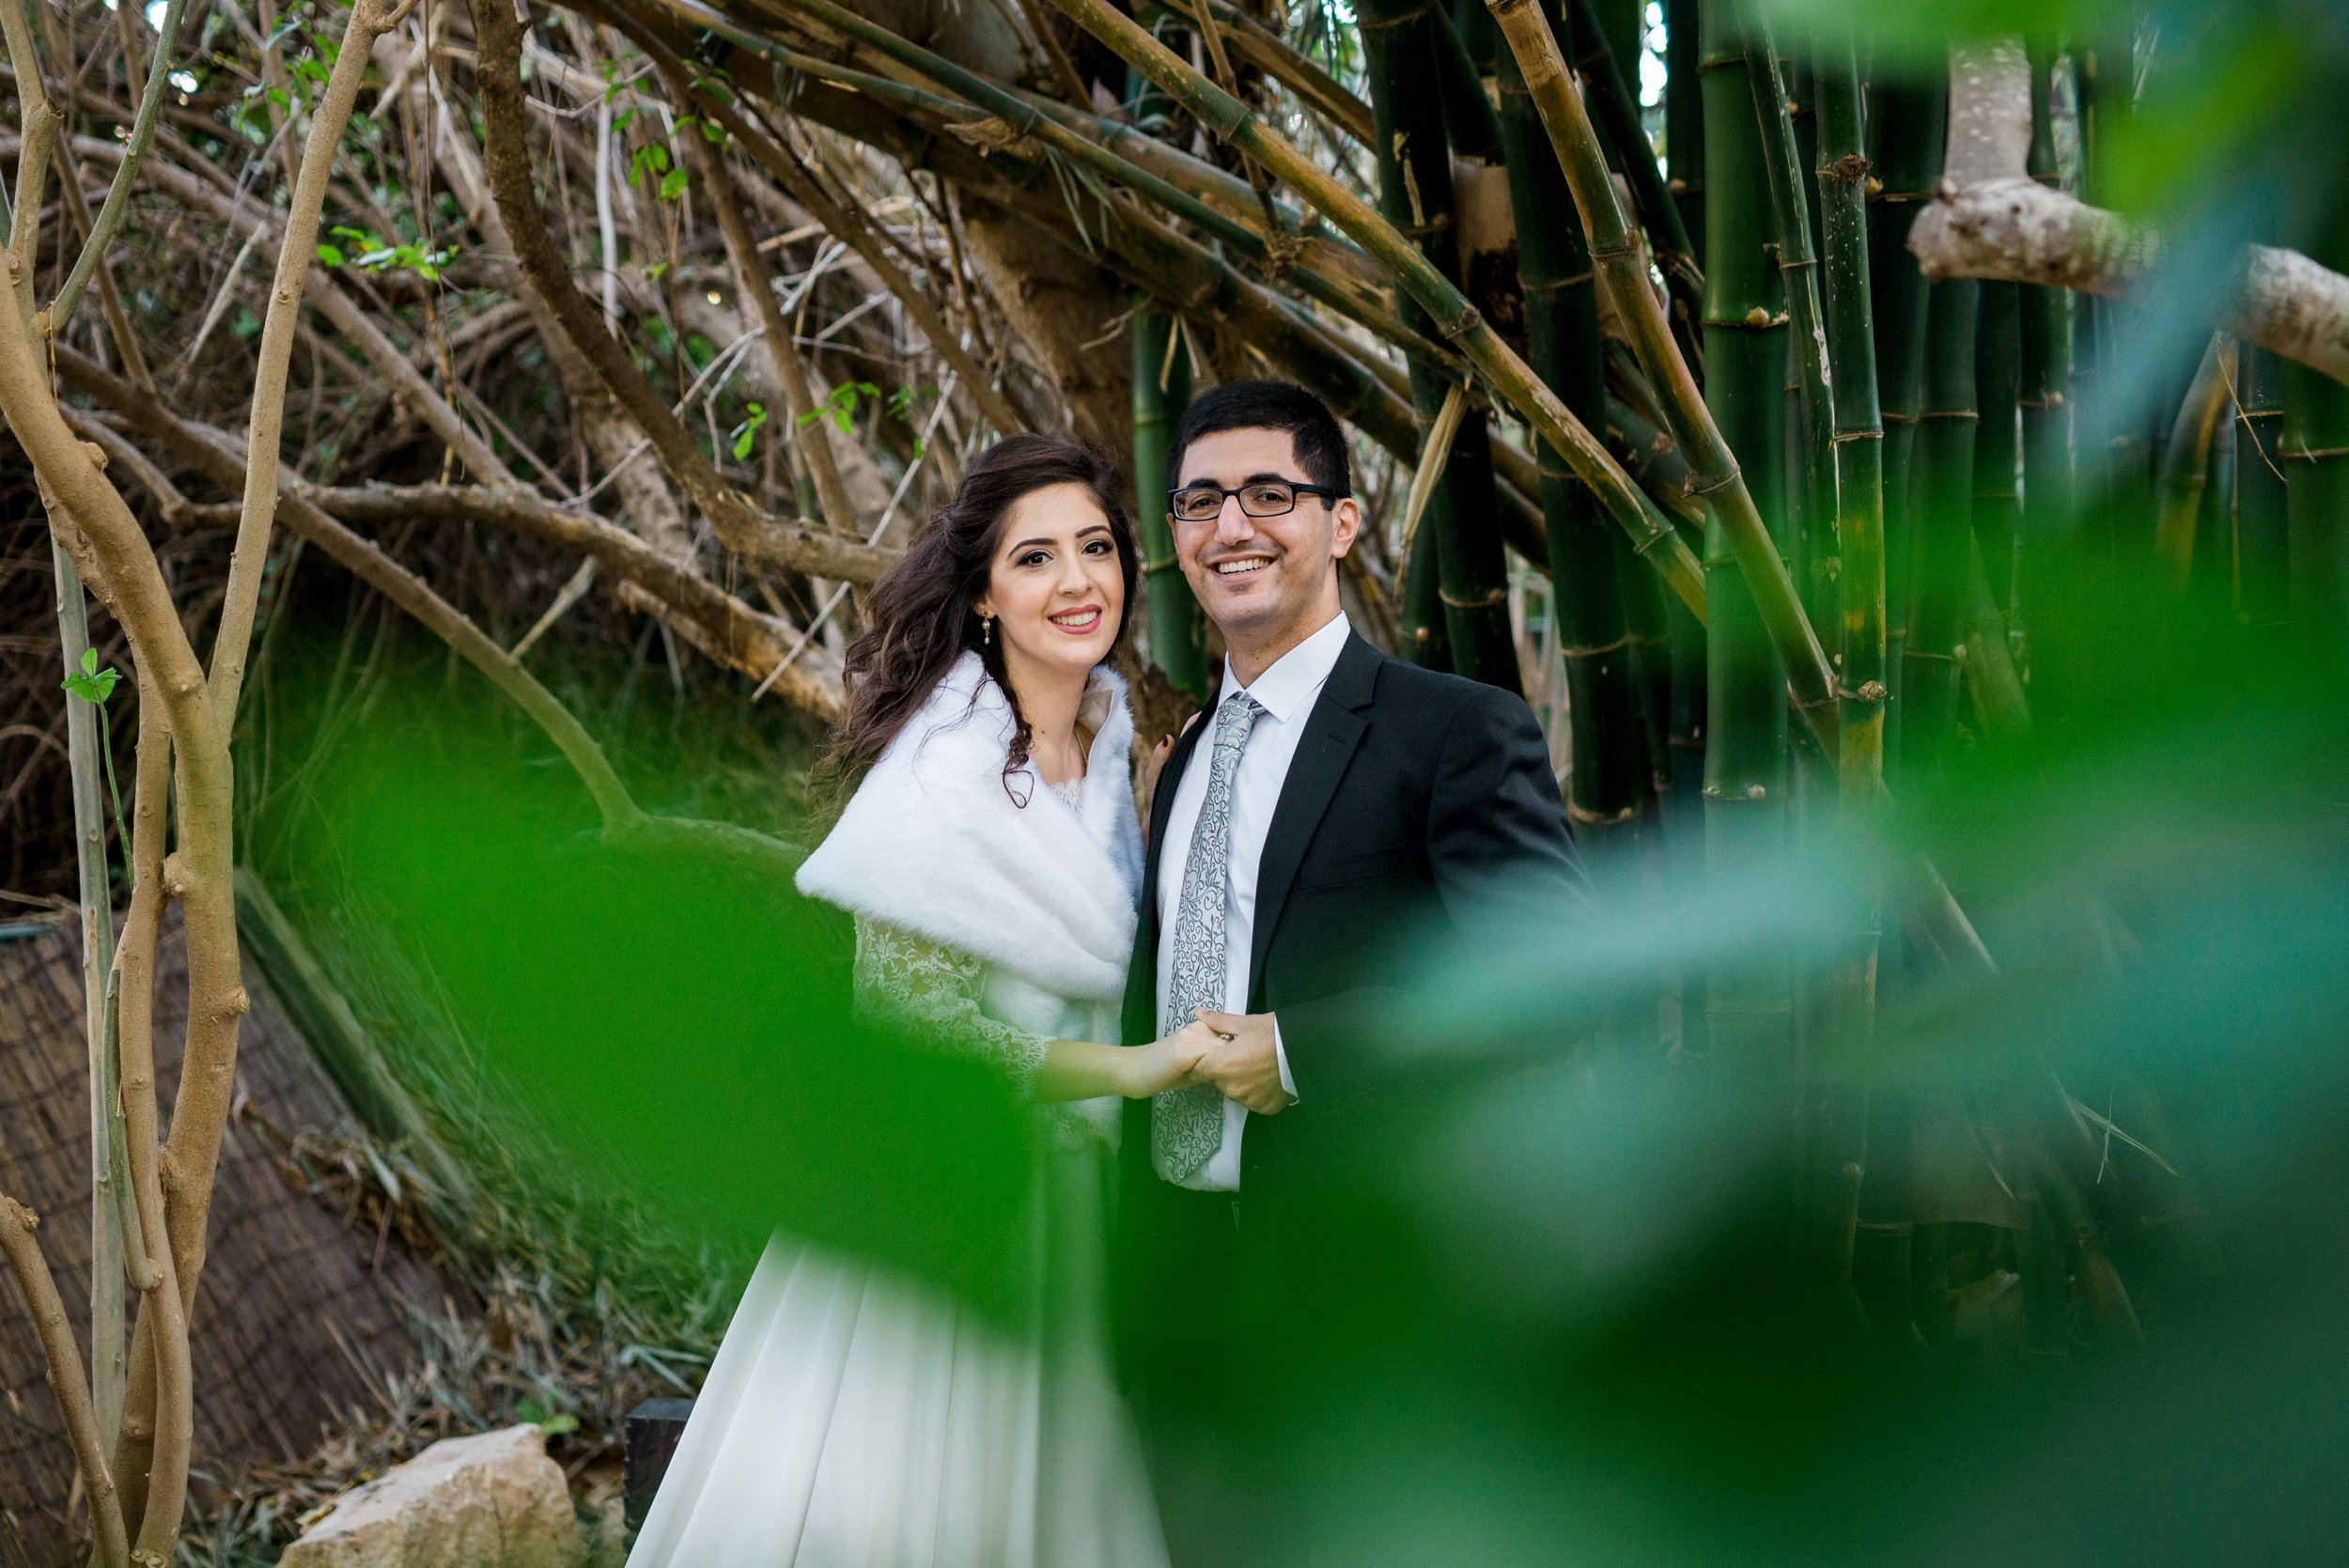 israel-garden-wedding-portraits-session-kate-giryes-photography--31_WEB.jpg